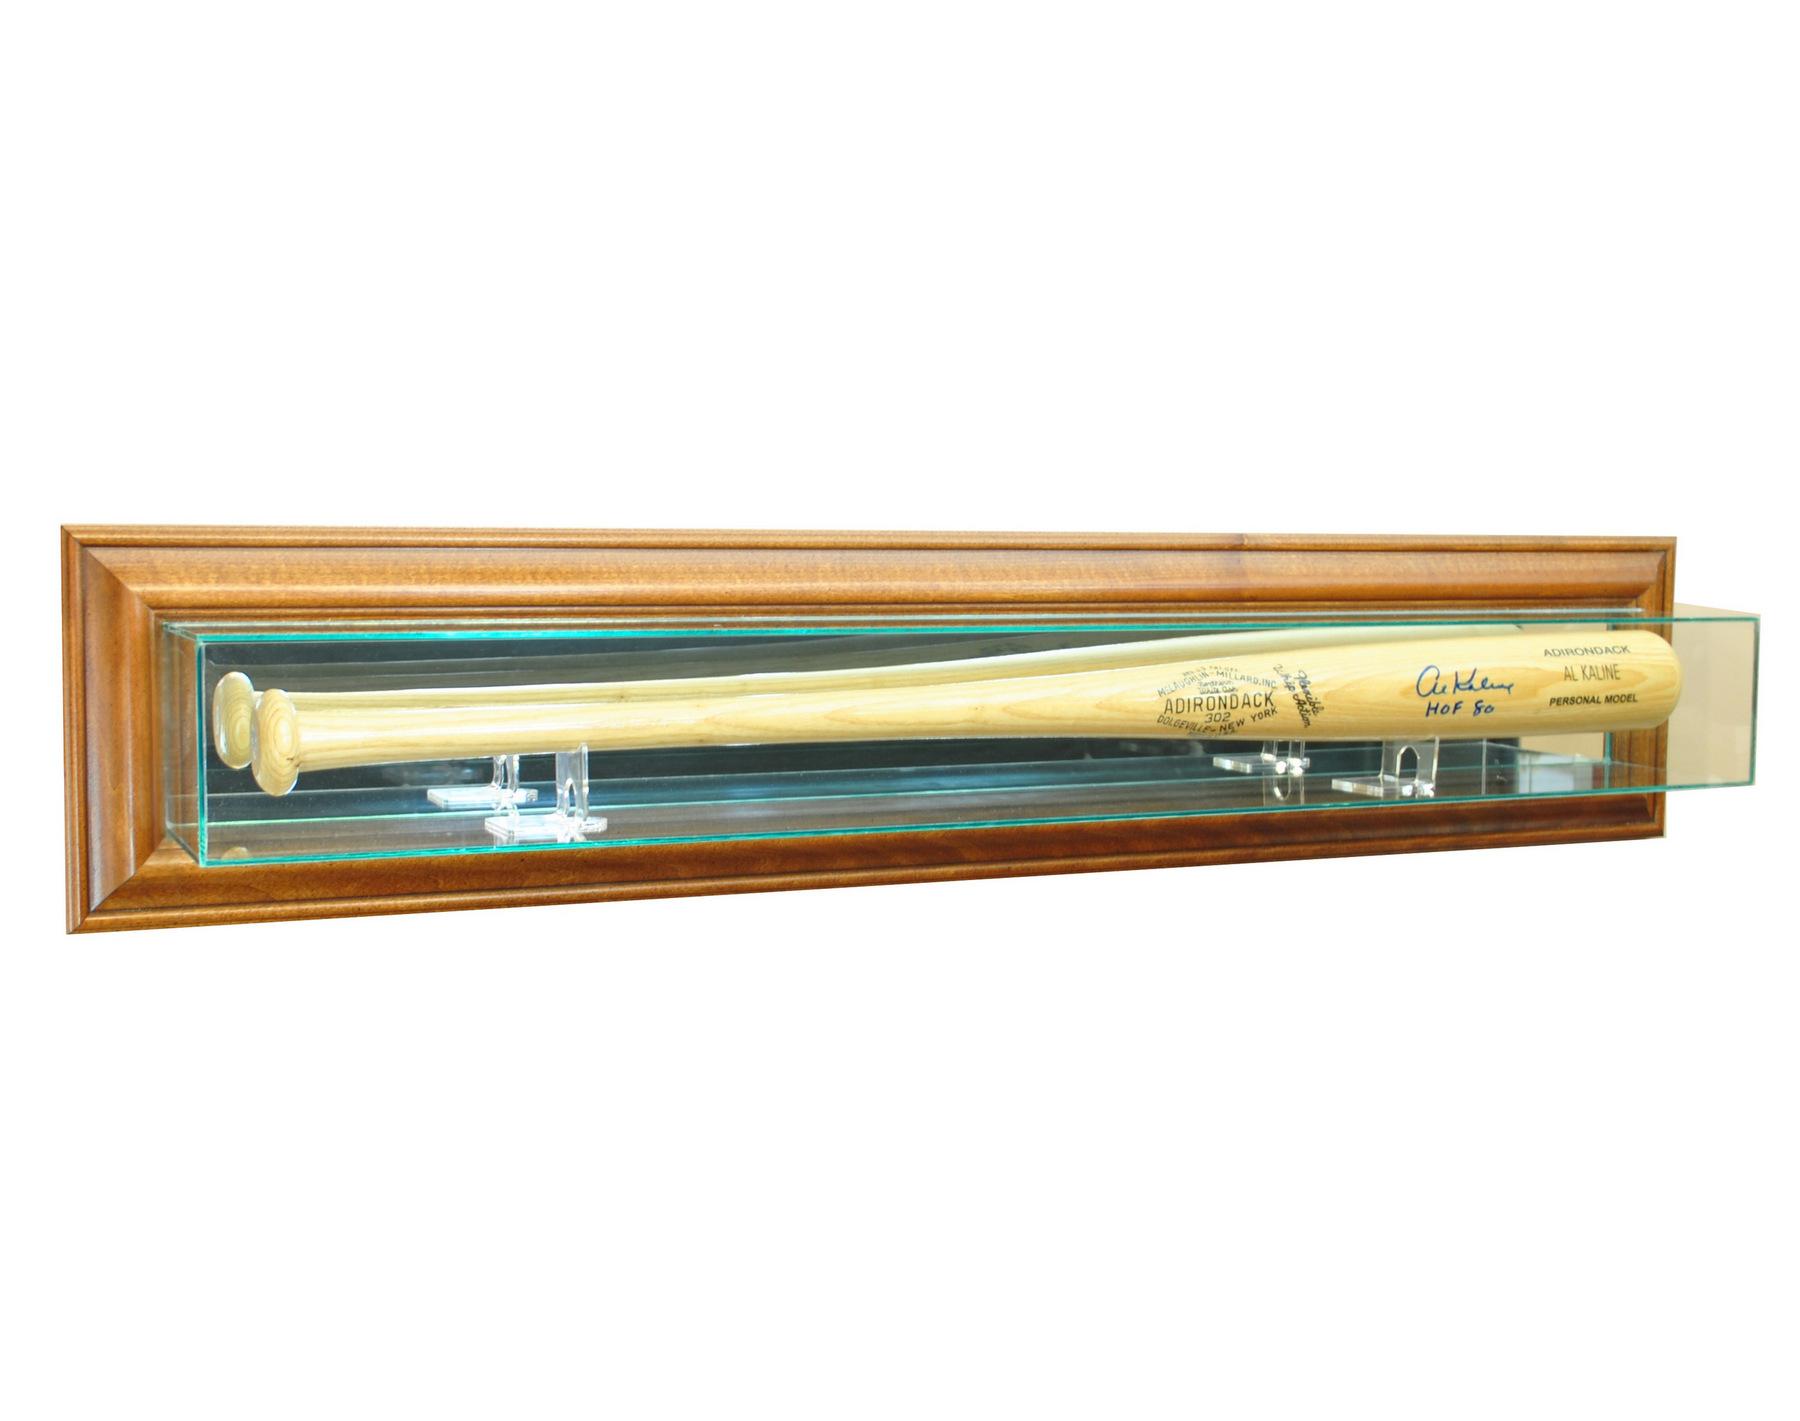 glass wall mount baseball bat display case with uv protection walnut wood frame ebay. Black Bedroom Furniture Sets. Home Design Ideas